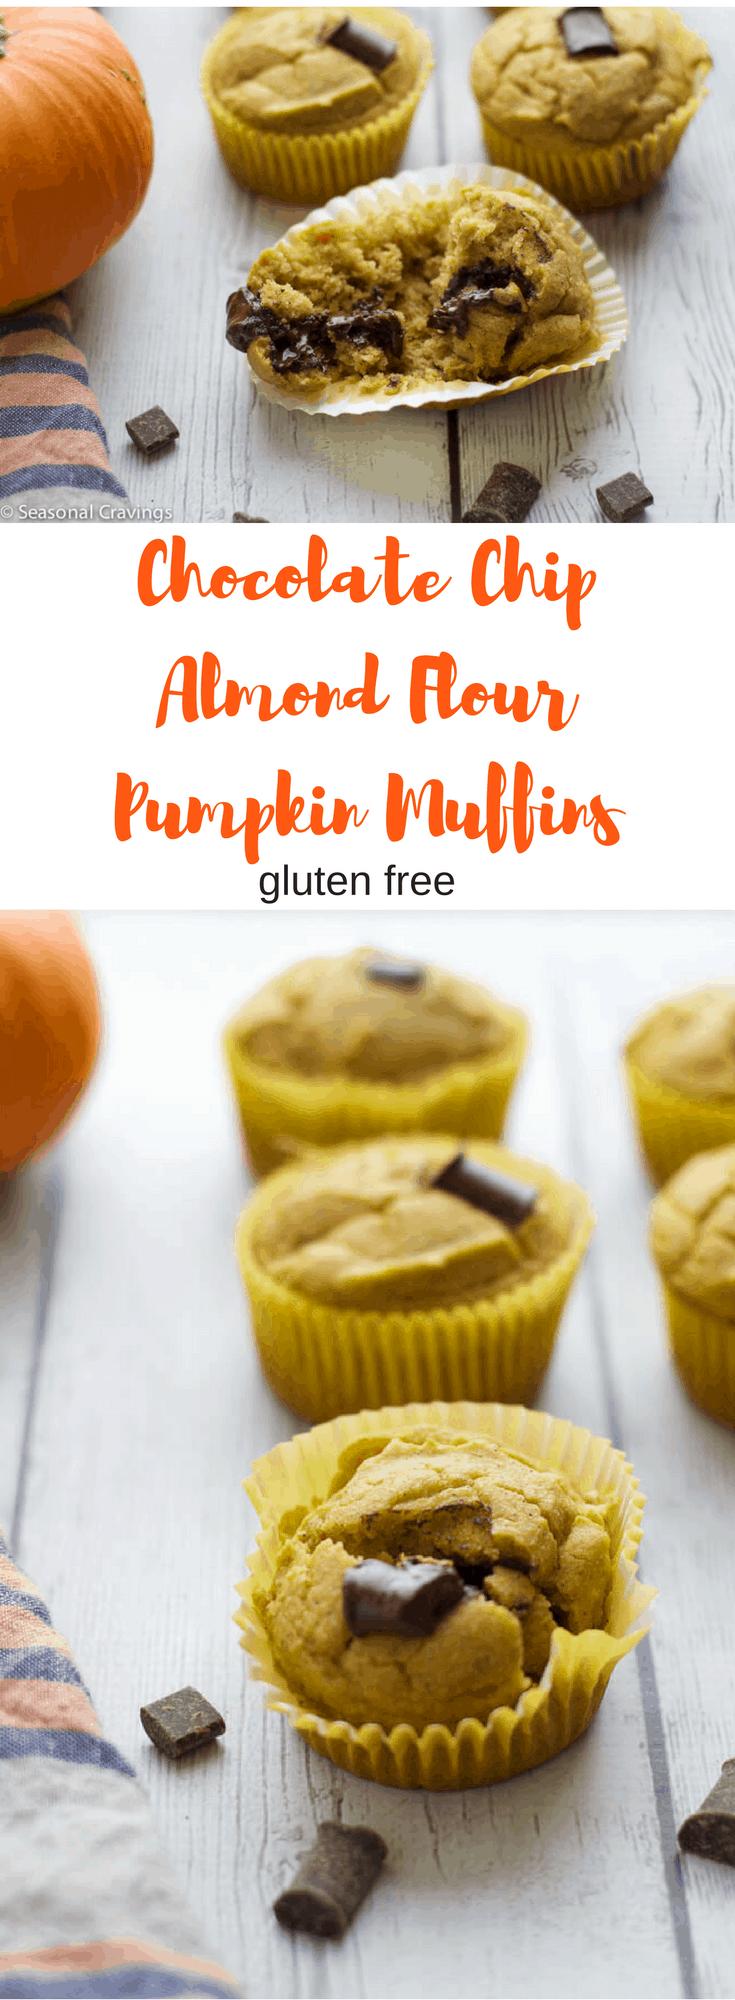 Chocolate Chip Almond Flour Pumpkin Muffins